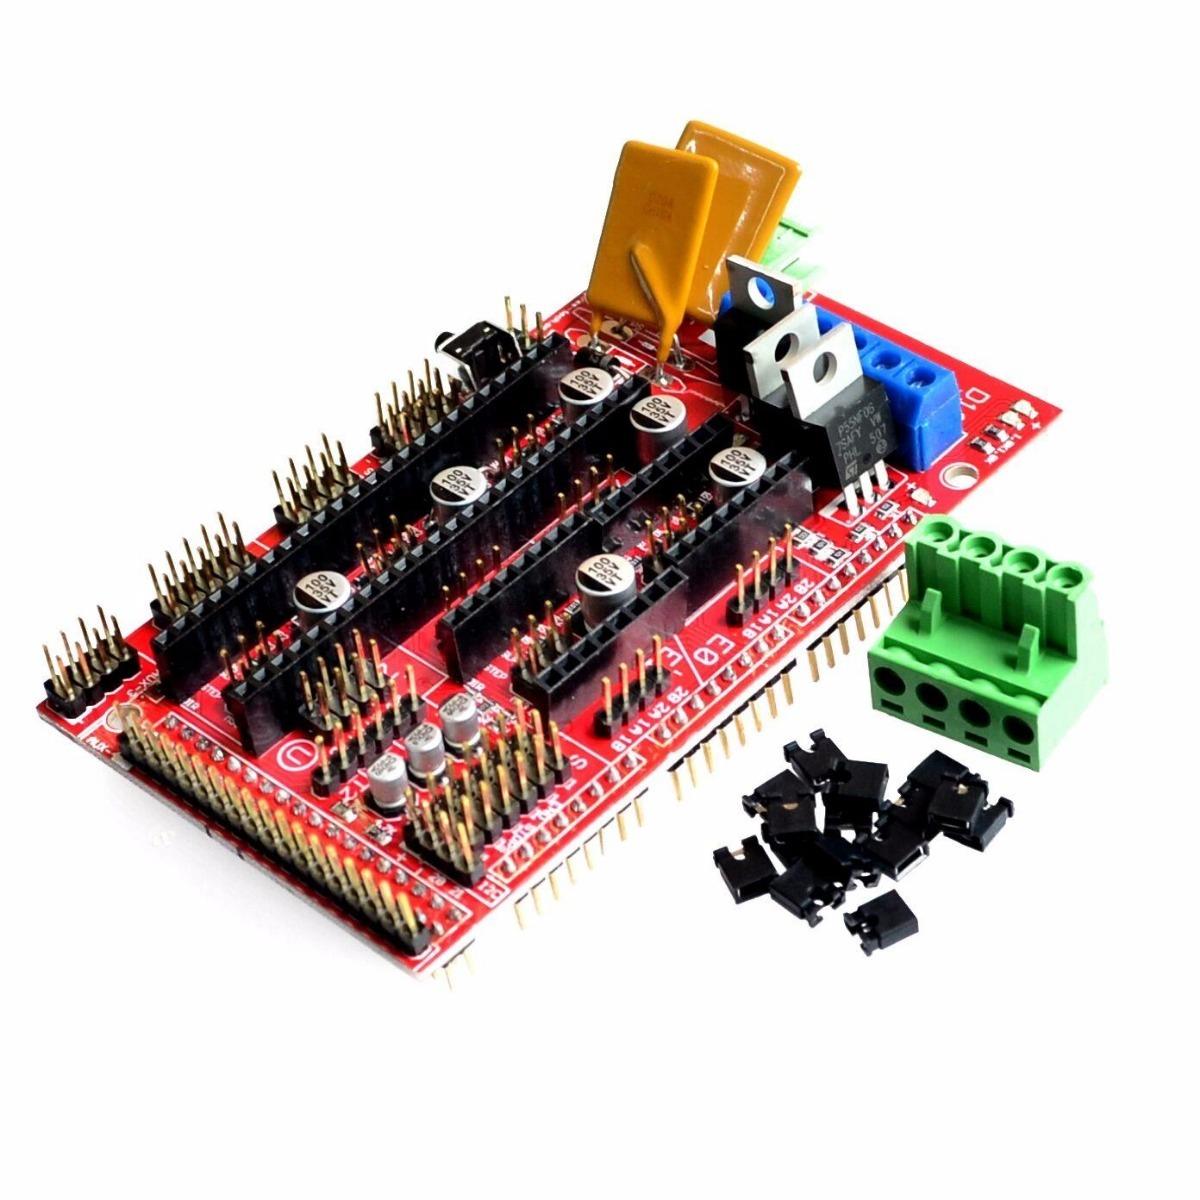 Kit Impresora 3d Arduino Mega 2560 Usb Ramps 5 A4988 Nut R3 1 4 Drivers Para Cargando Zoom